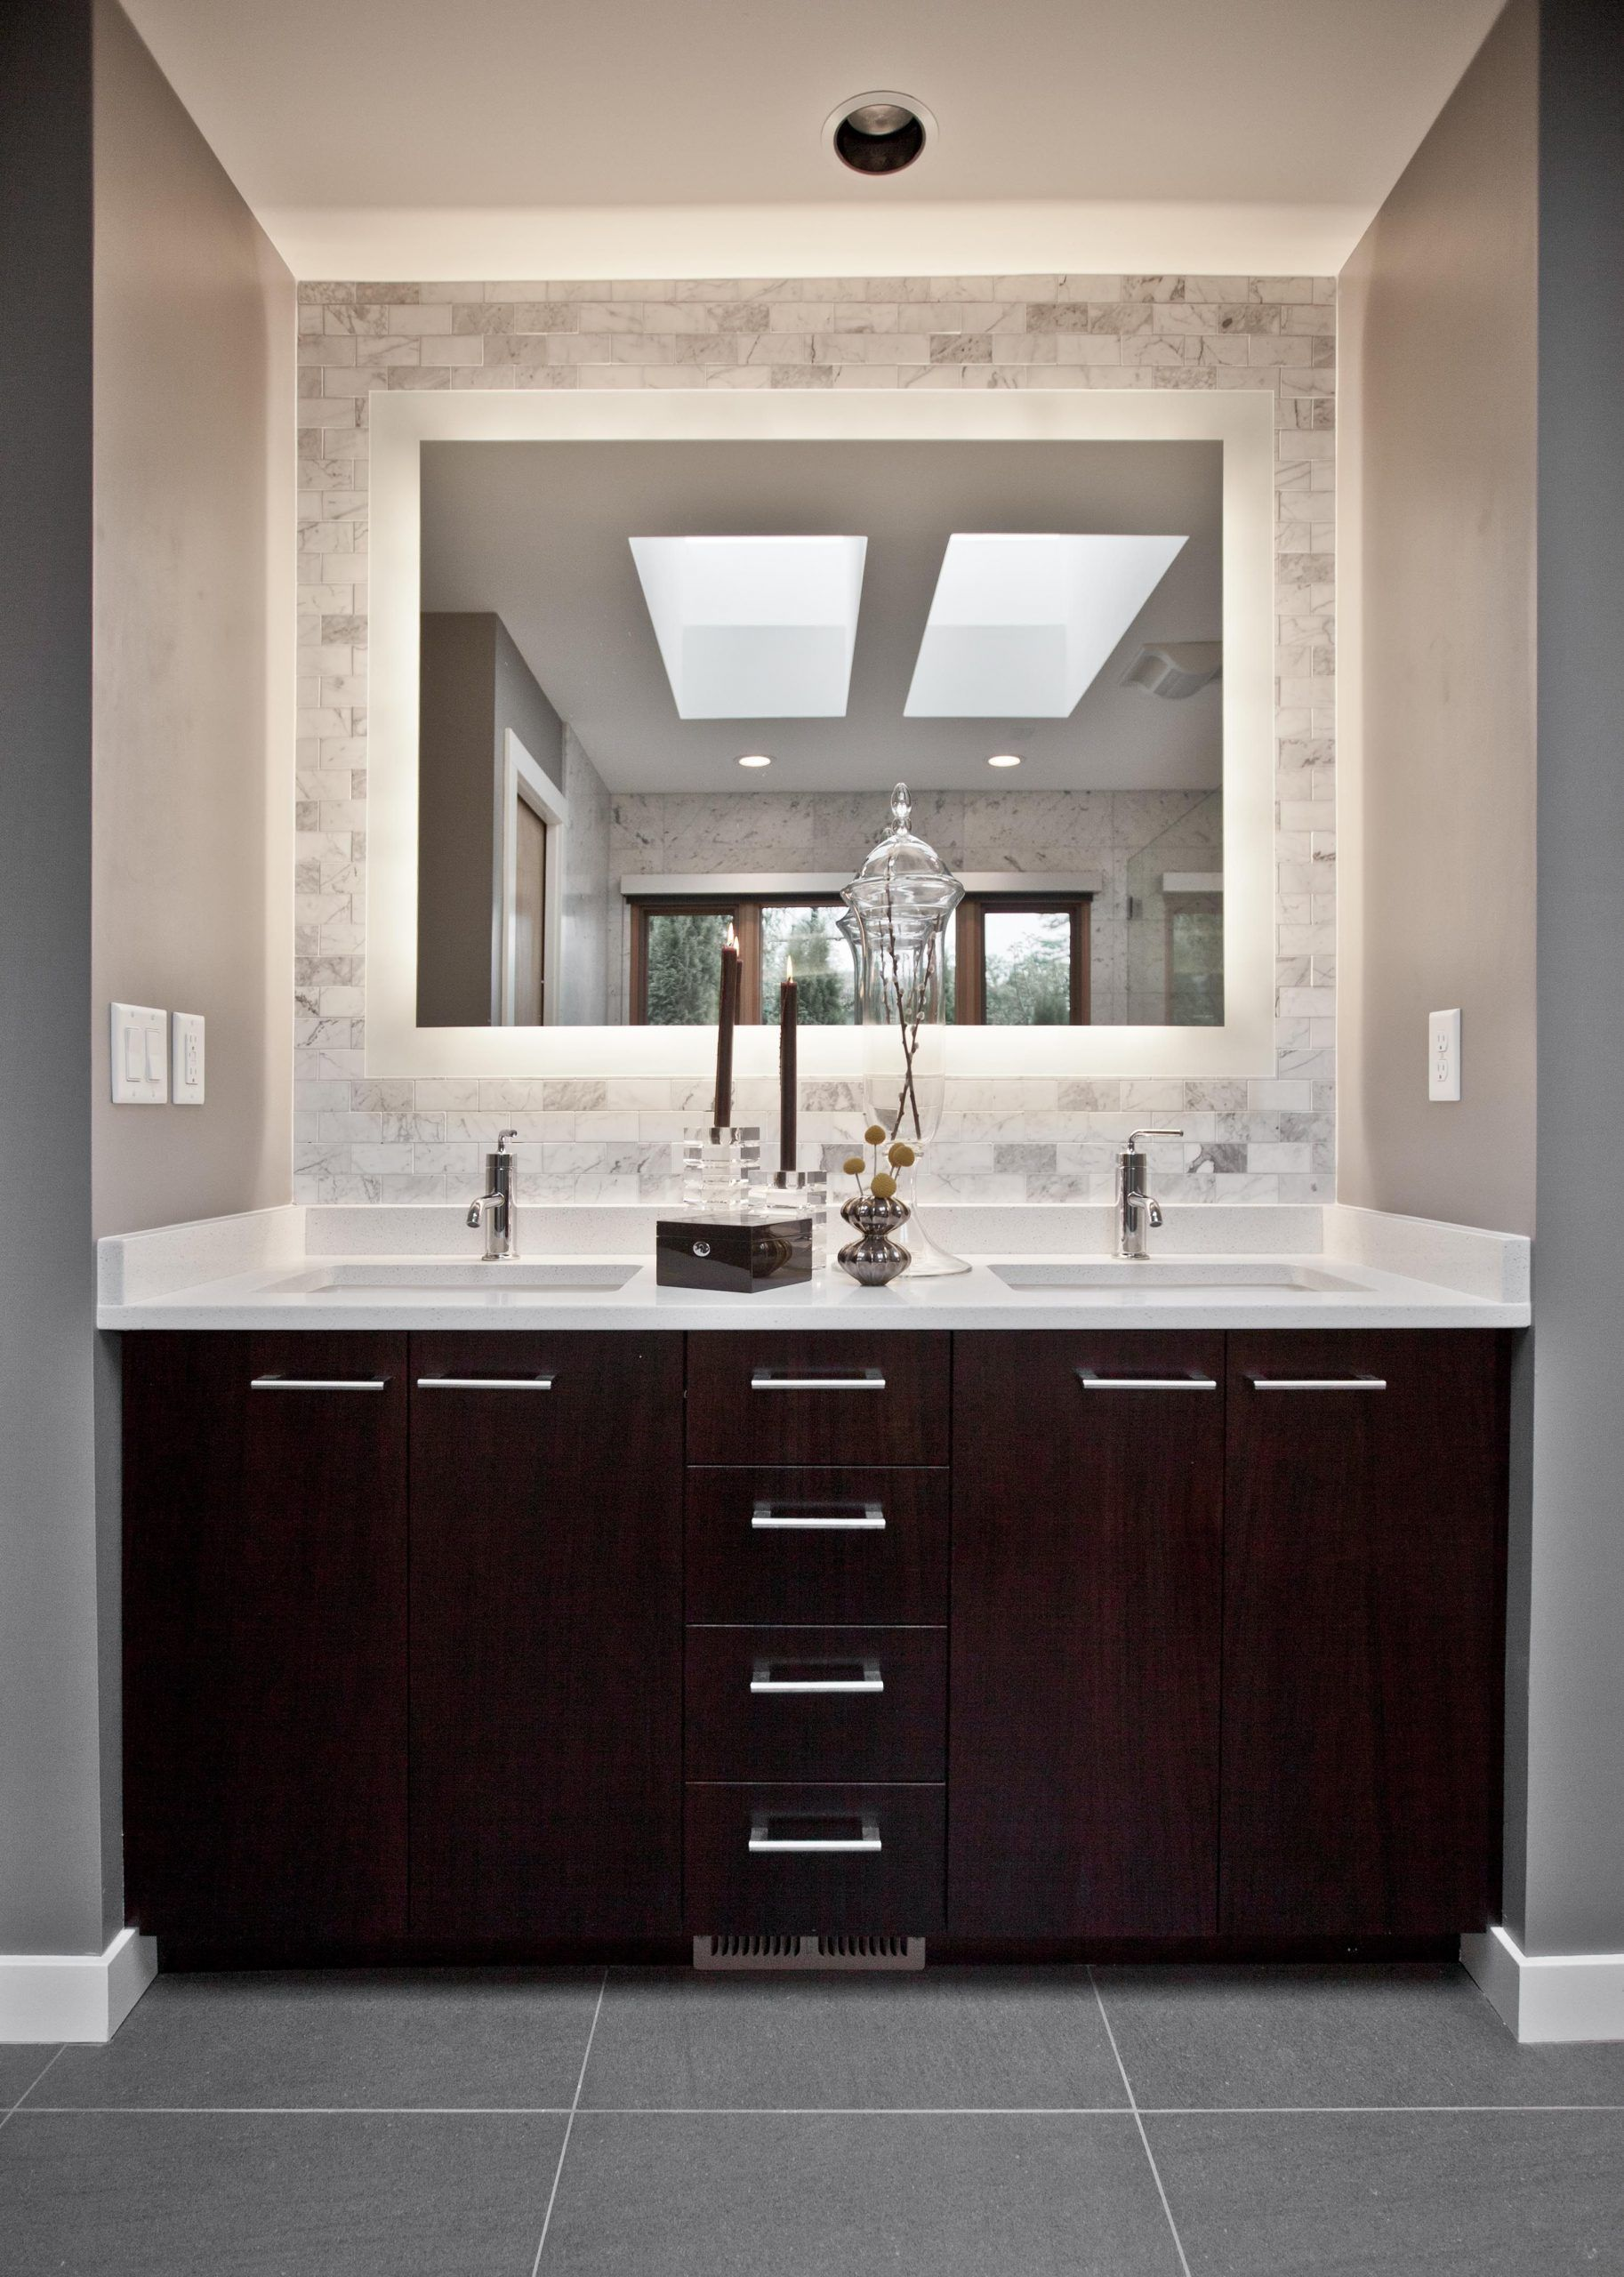 Bathroom Mirror Ideas To Inspire You Best In 2020 Home Depot Bathroom Vanity Master Bathroom Vanity Trendy Bathroom